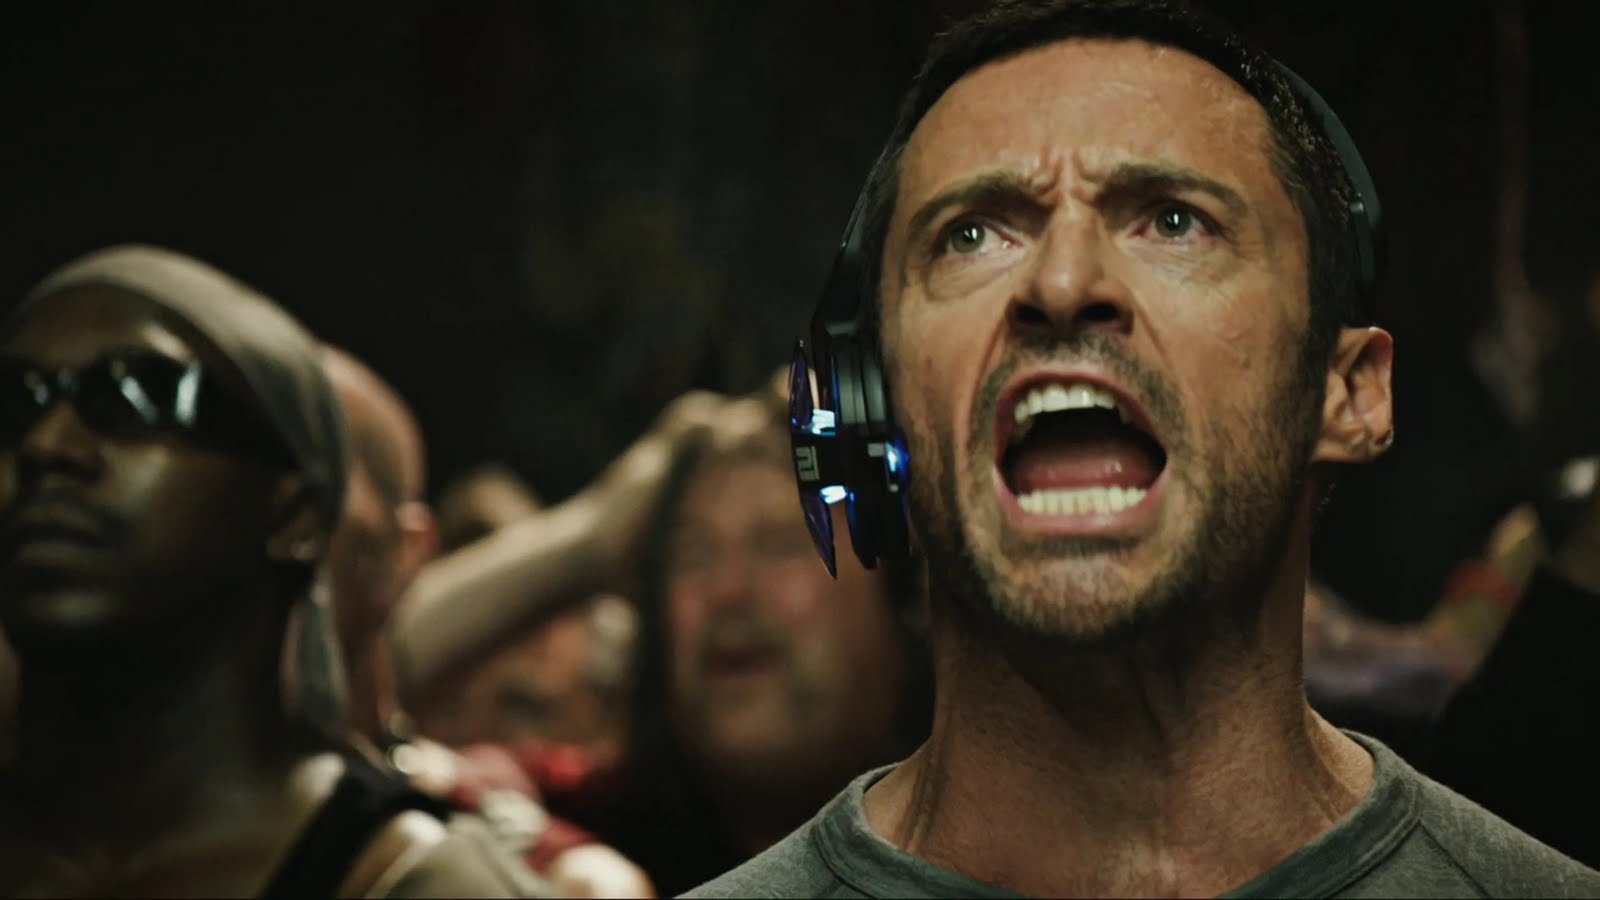 http://2.bp.blogspot.com/-DMFLVohb1Ws/TmMrlZlT6zI/AAAAAAAABvk/mHfx3Z0zZC8/s1600/Real-Steel-2011-movie-Hugh_Jackman-10.jpg